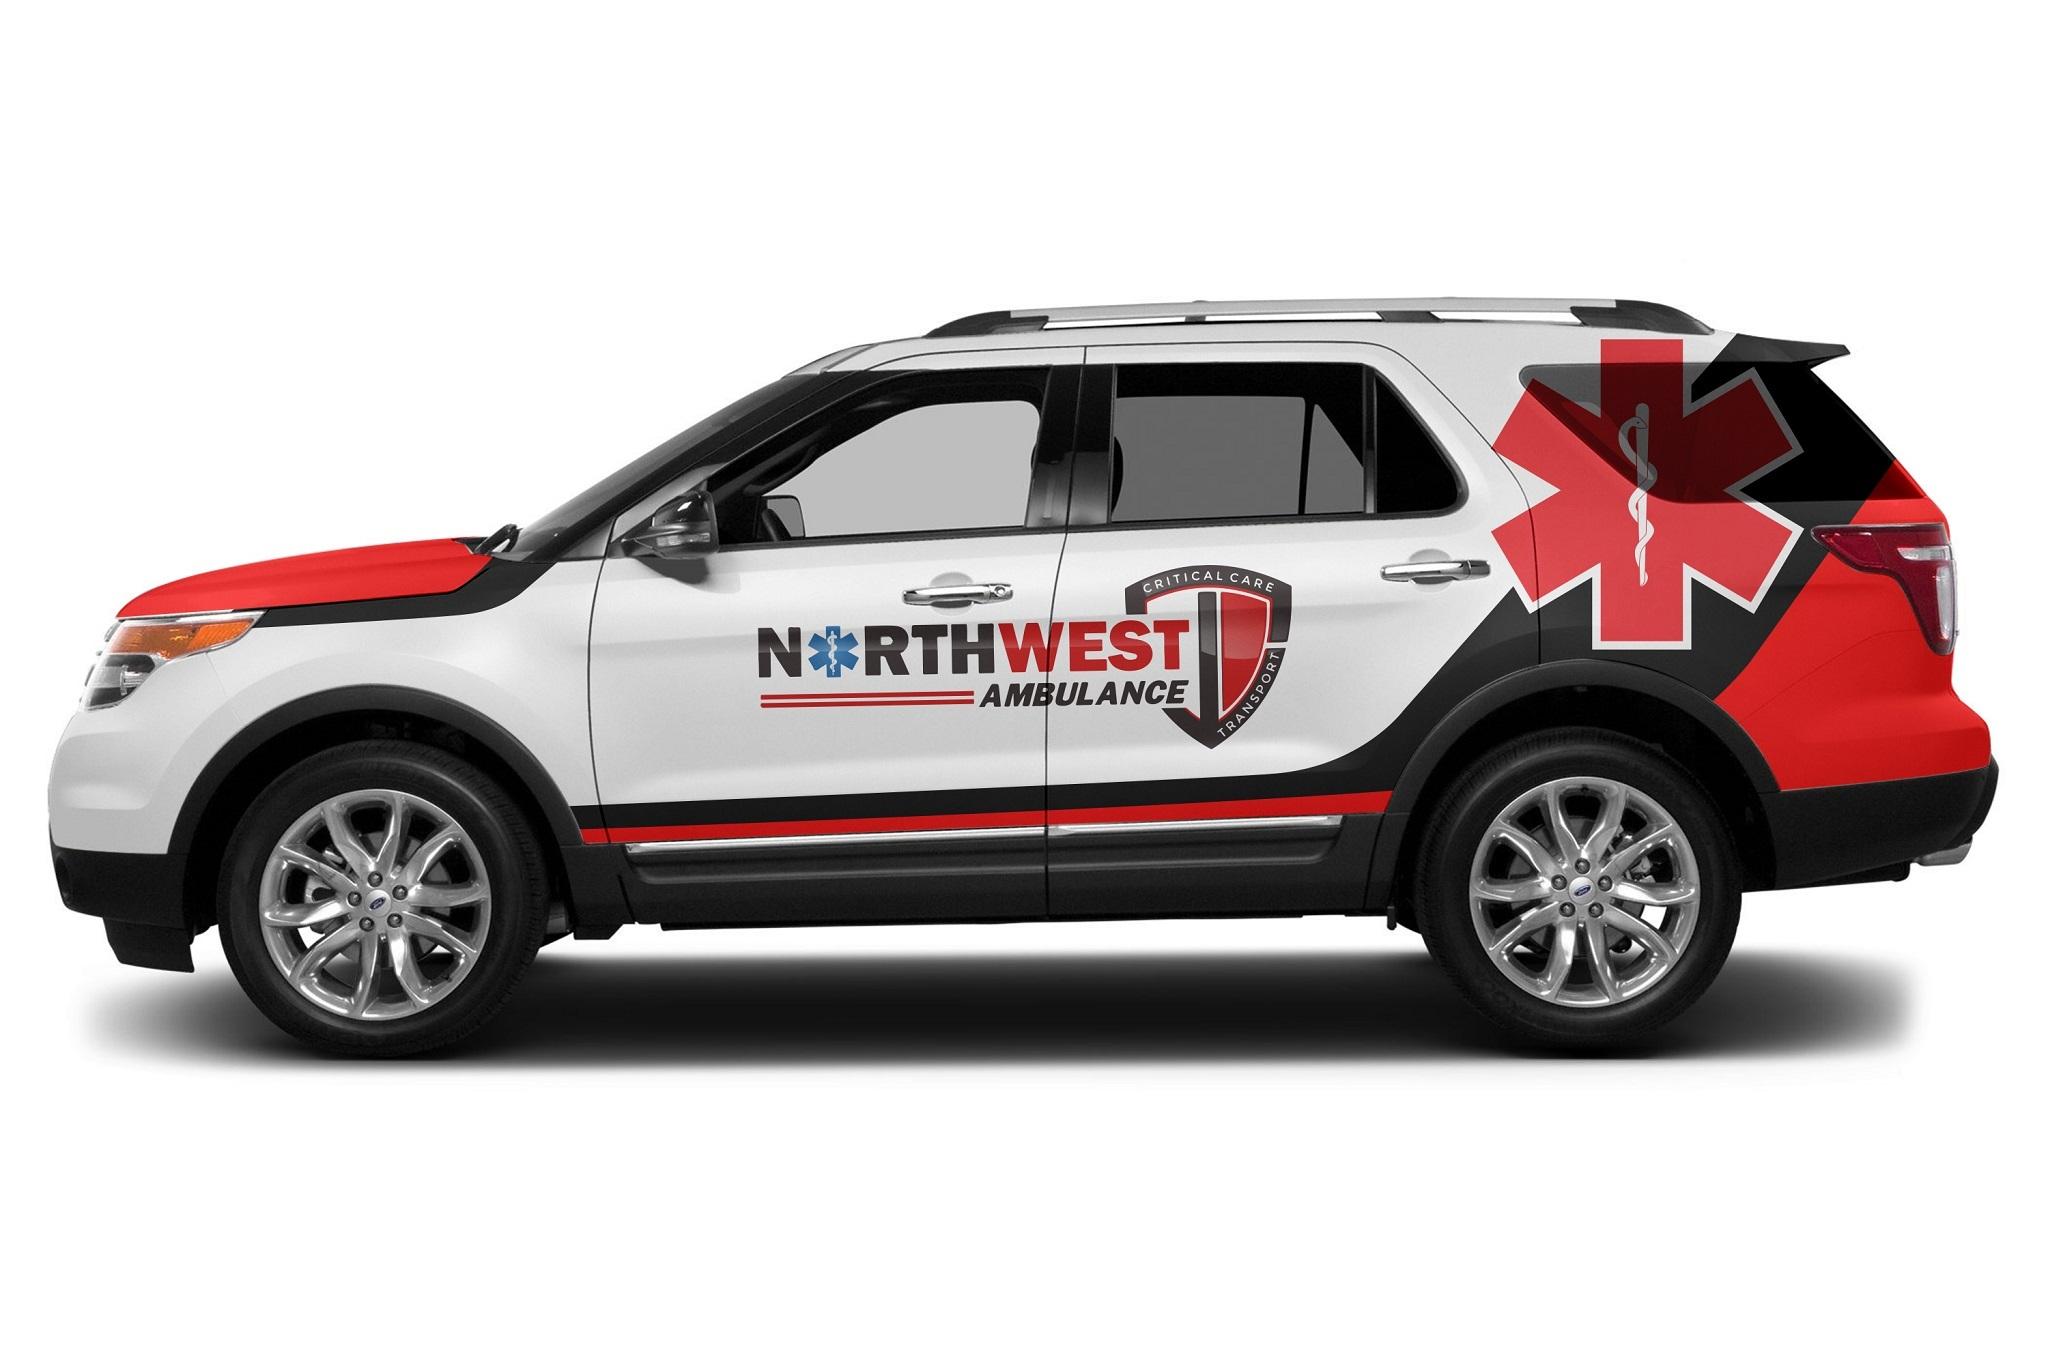 Paramedic Wrap For Northwest 99designs Car Sticker Design Car Wrap Design Truck Design [ 1351 x 2048 Pixel ]